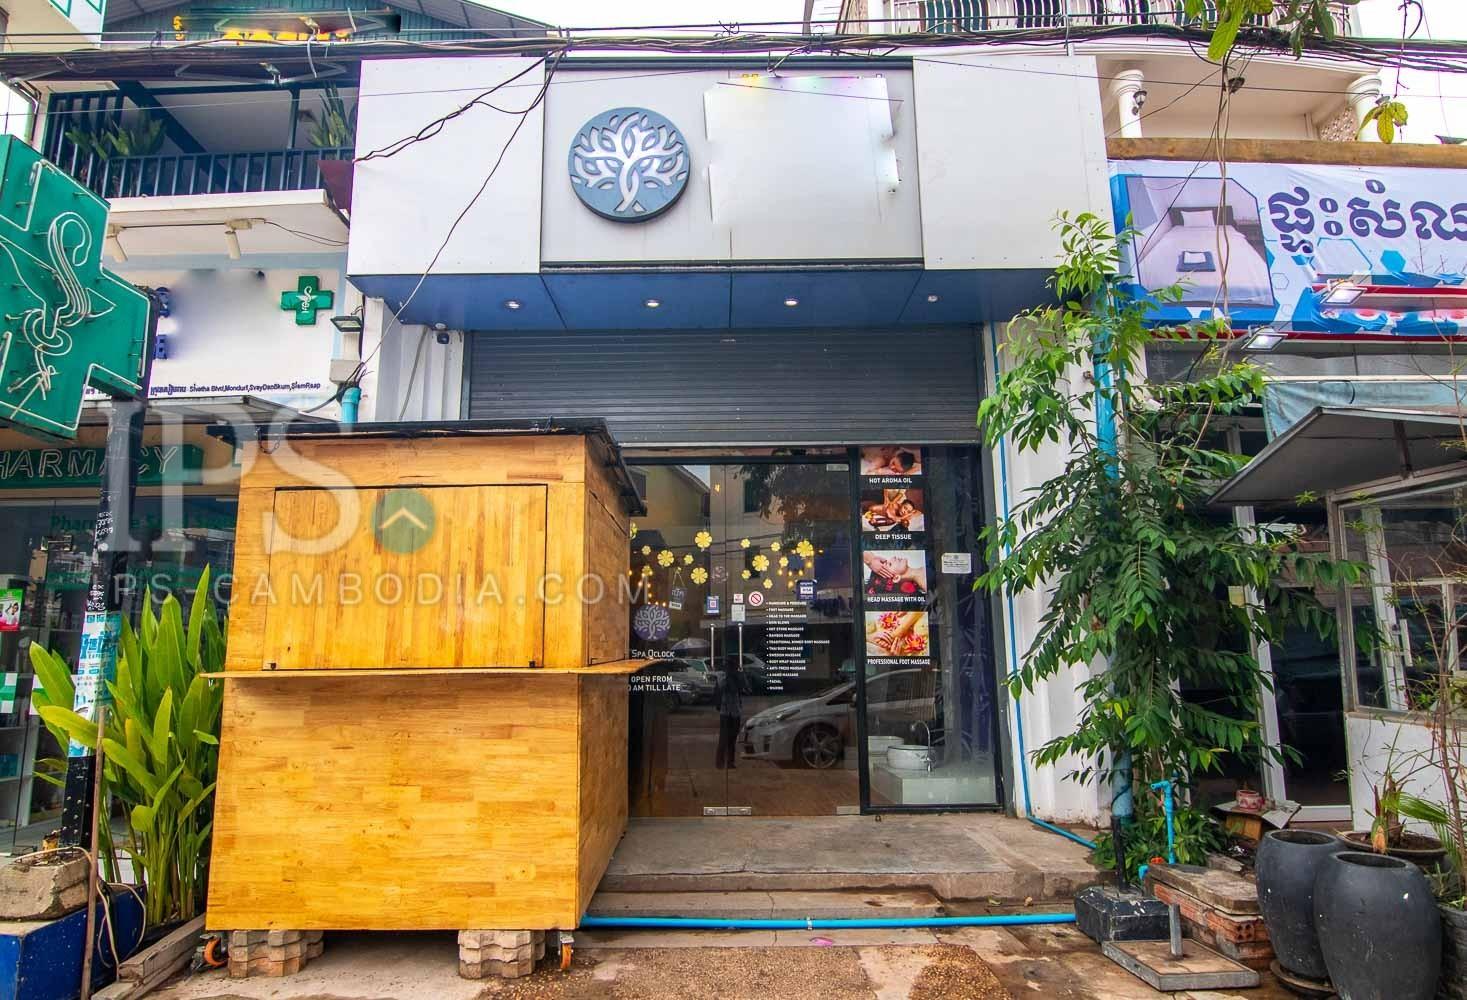 7 Bedroom House For Sale - Pub Street, Siem Reap